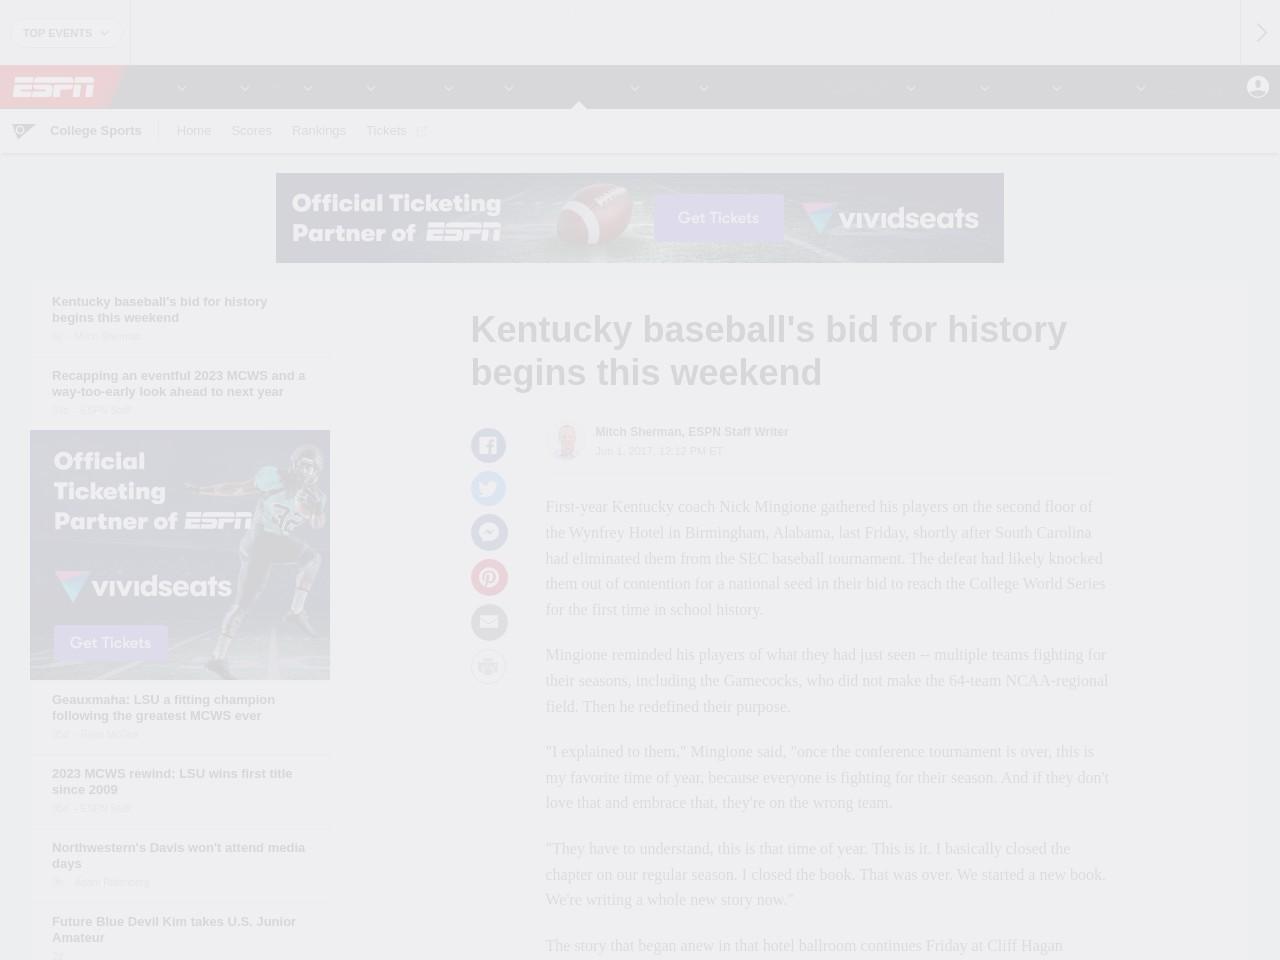 Kentucky baseball's bid for history begins this weekend